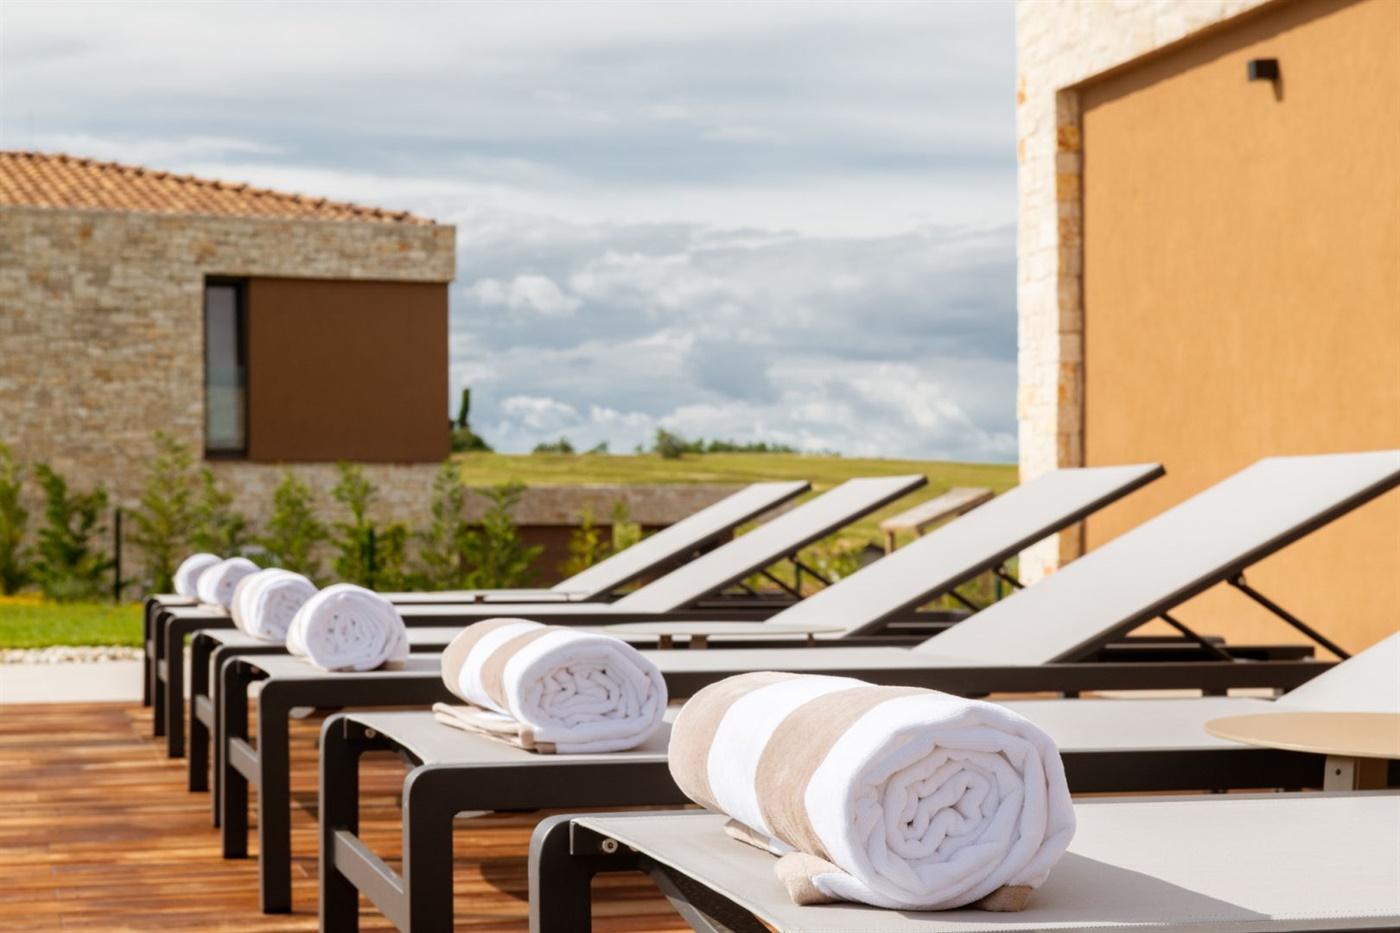 Sunbathing and pool